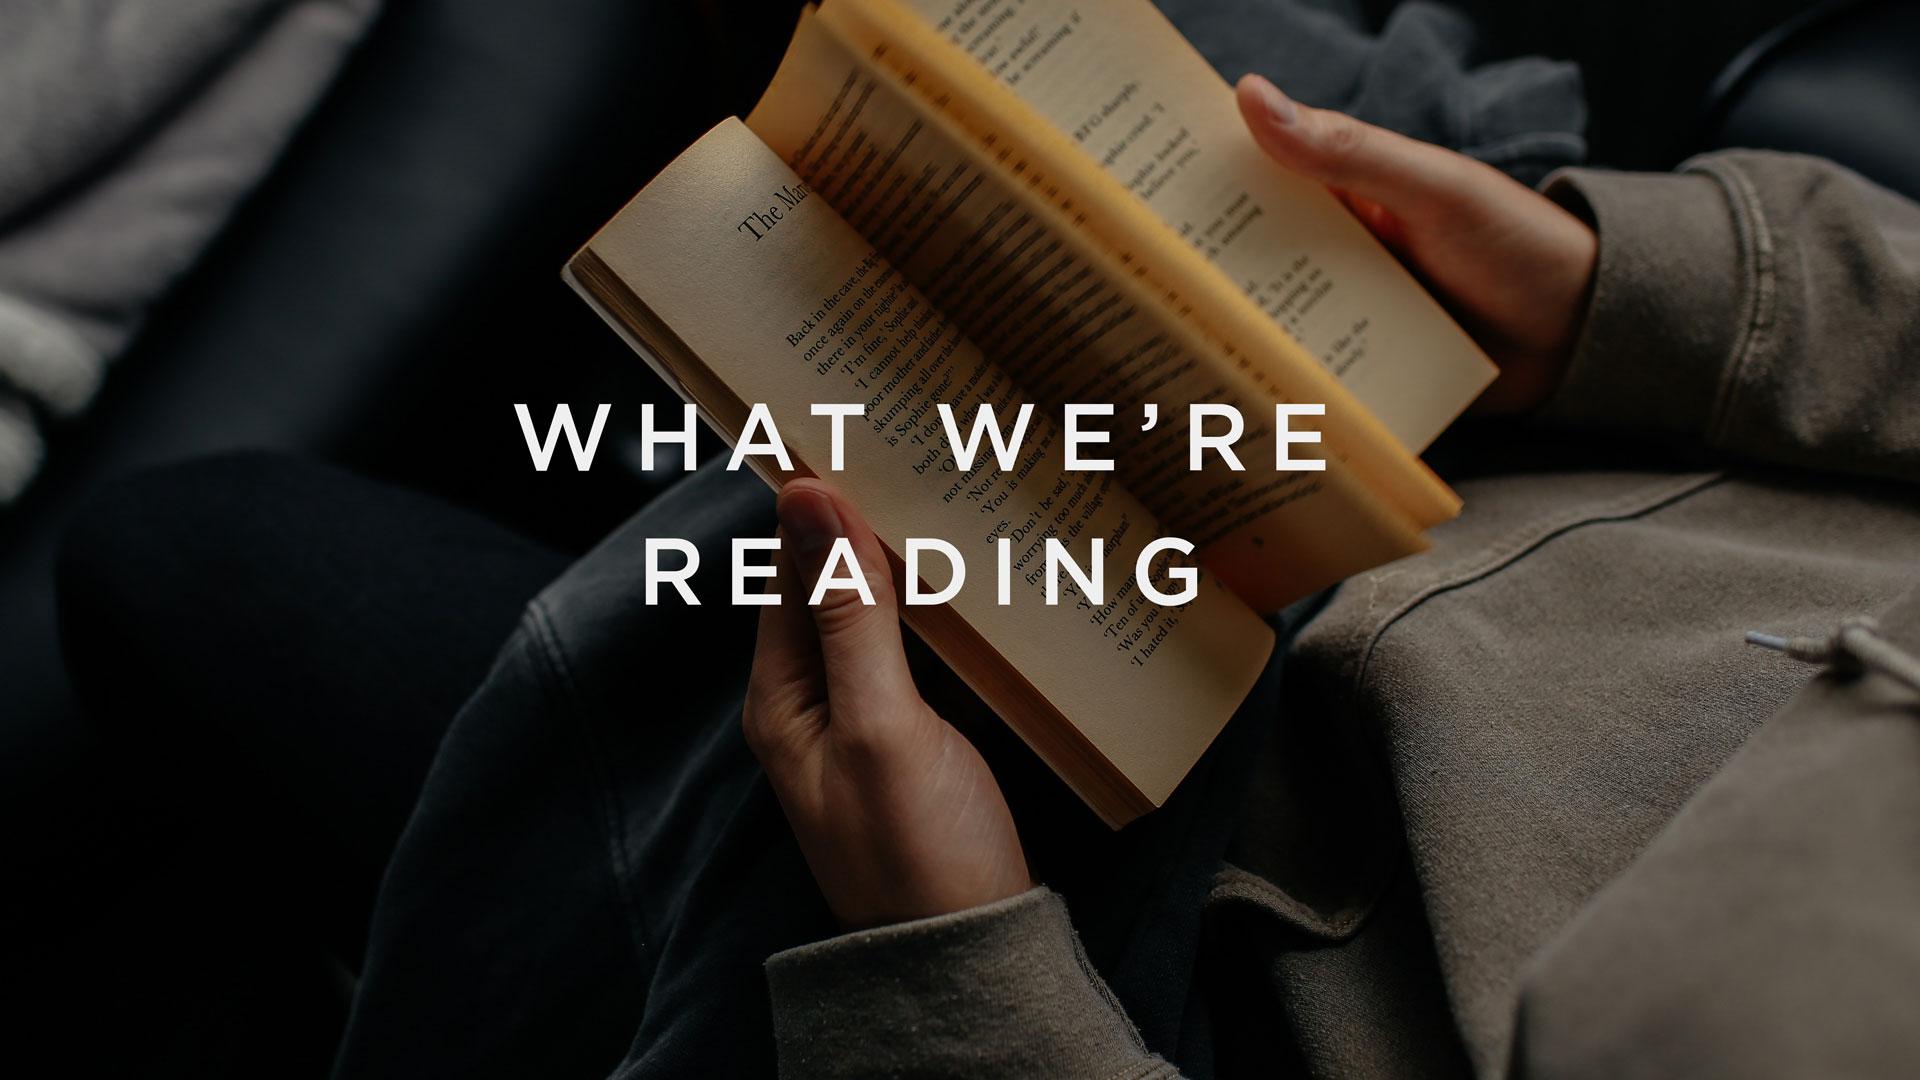 what-were-reading.jpg